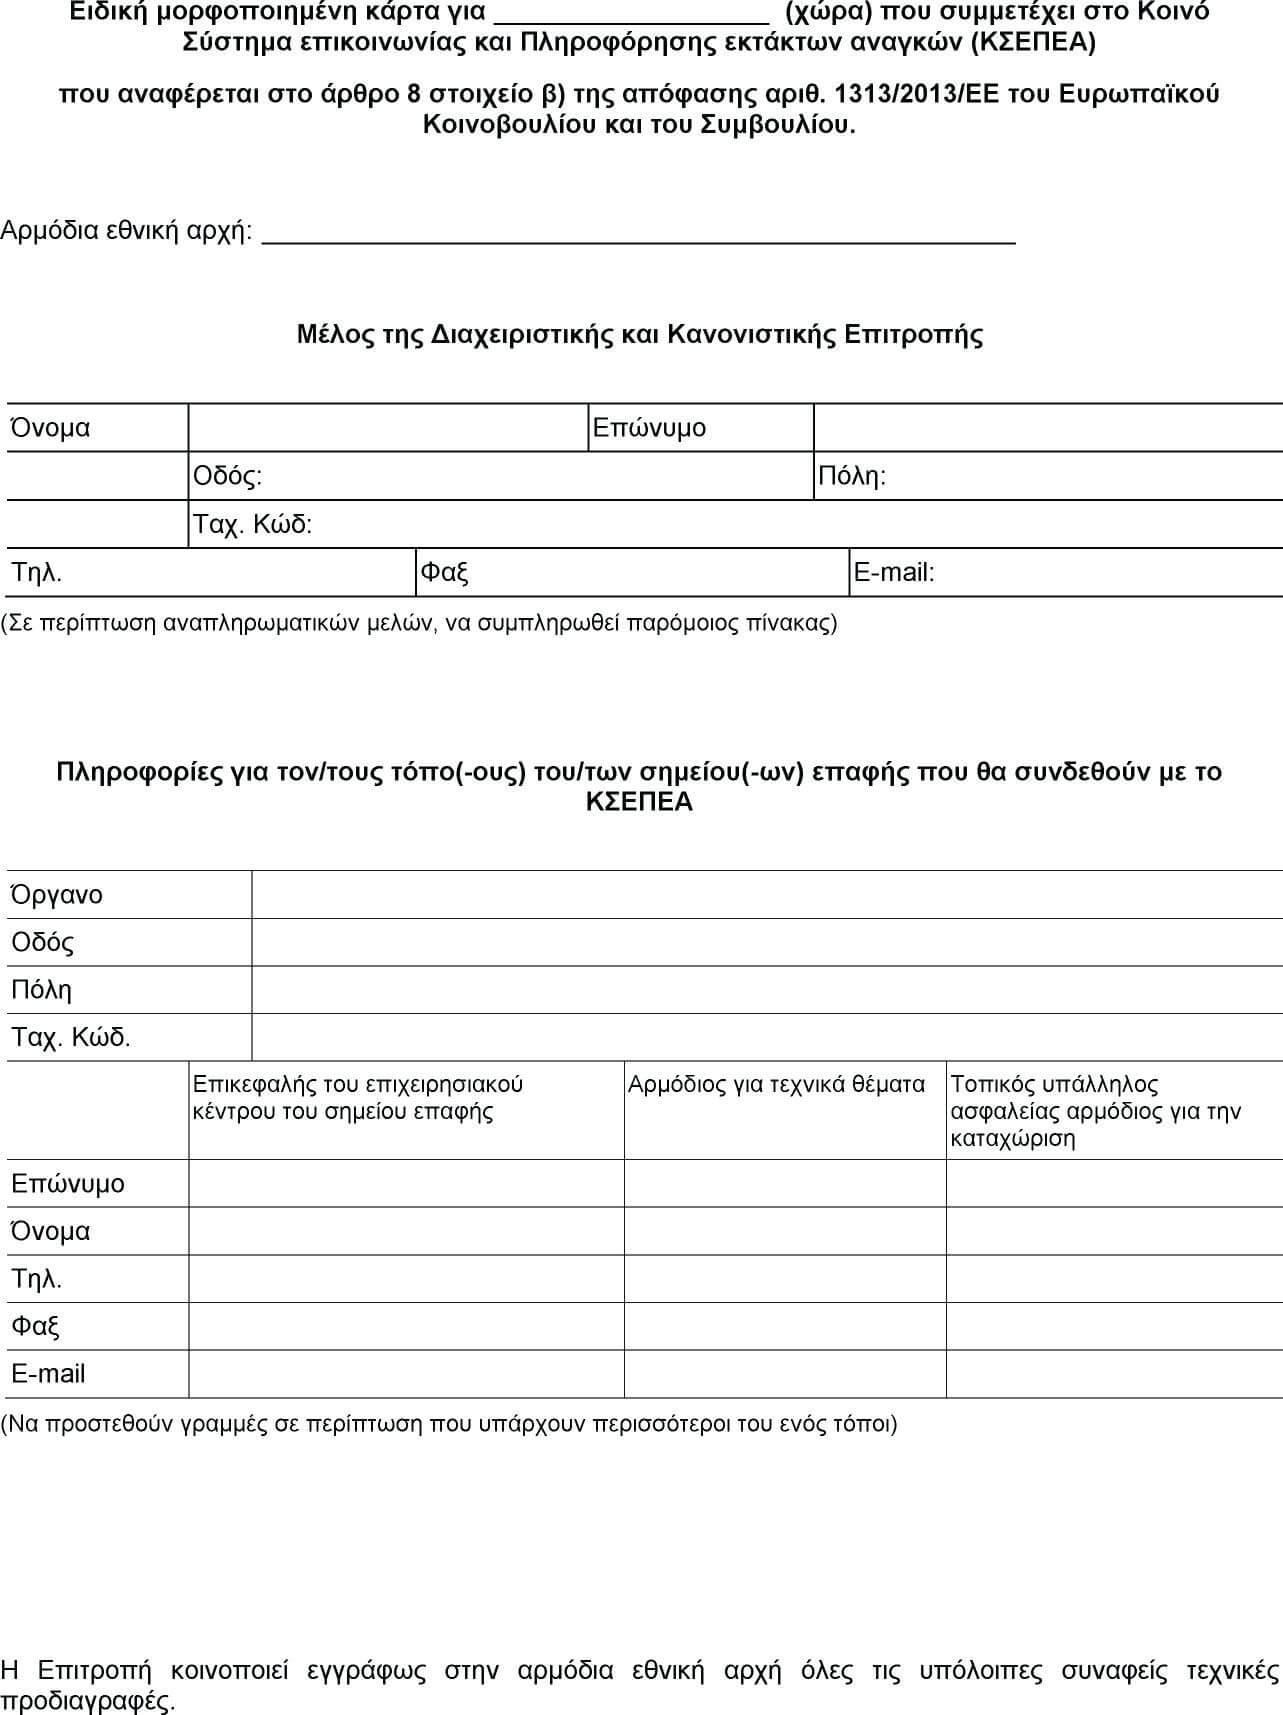 Handover Certificate Template - Hizir.kaptanband.co Regarding Handover Certificate Template